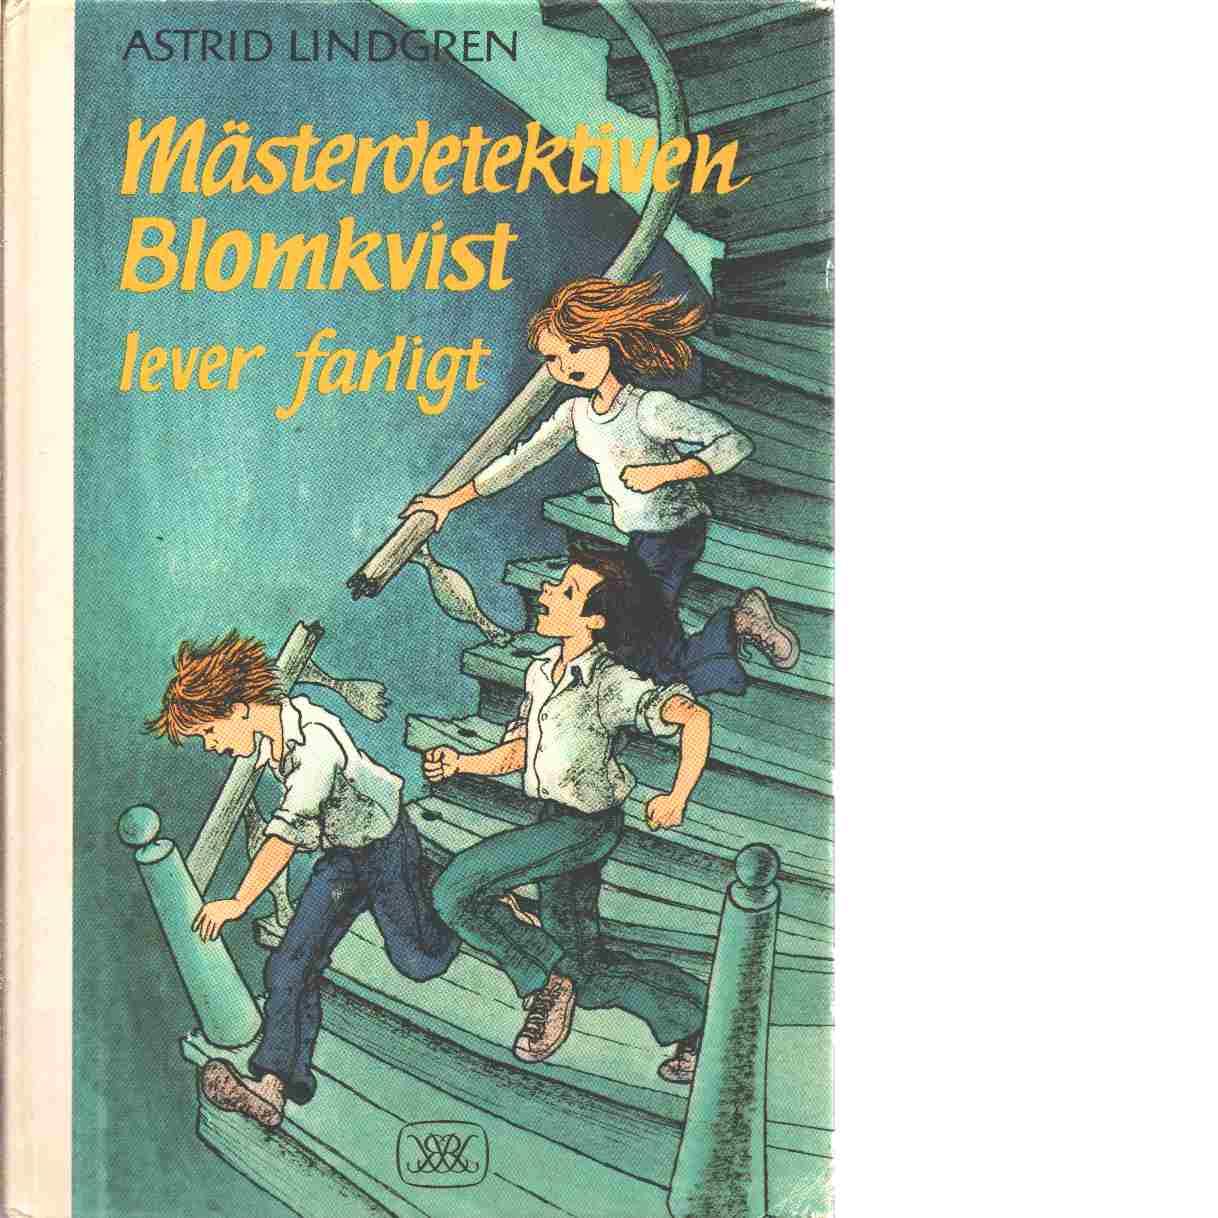 Mästerdetektiven Blomkvist lever farligt - Lindgren Astrid